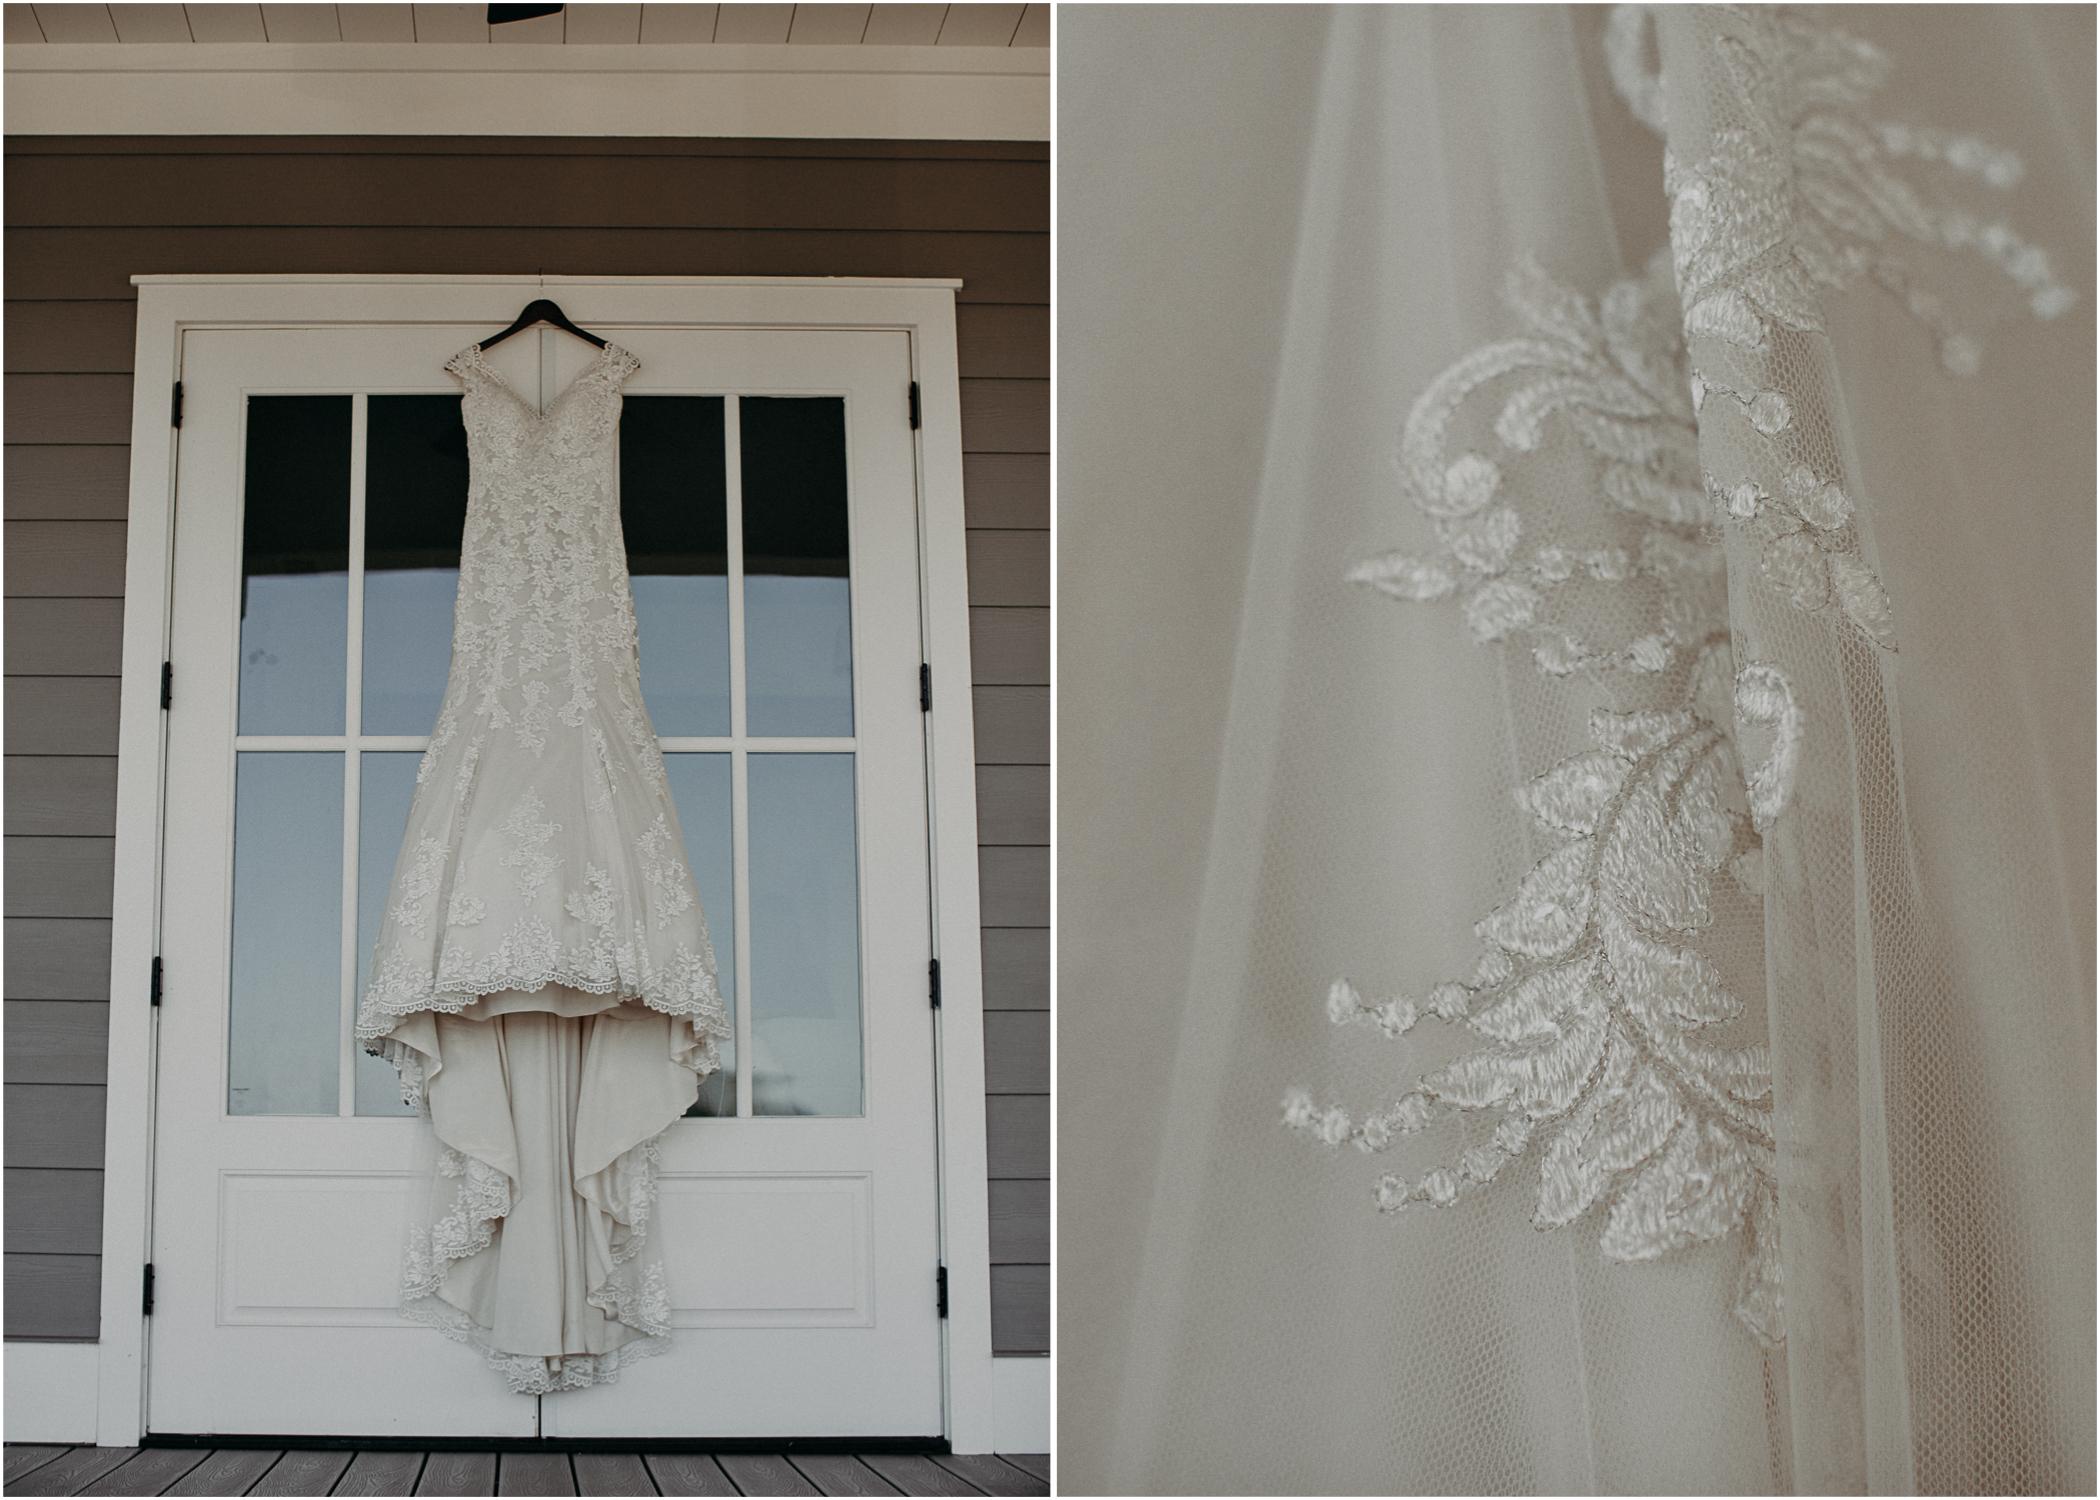 3- Wedding_day_atlanta_georgia_bridal_dress_aline_marin_photography_wedding_photographer-3.jpg